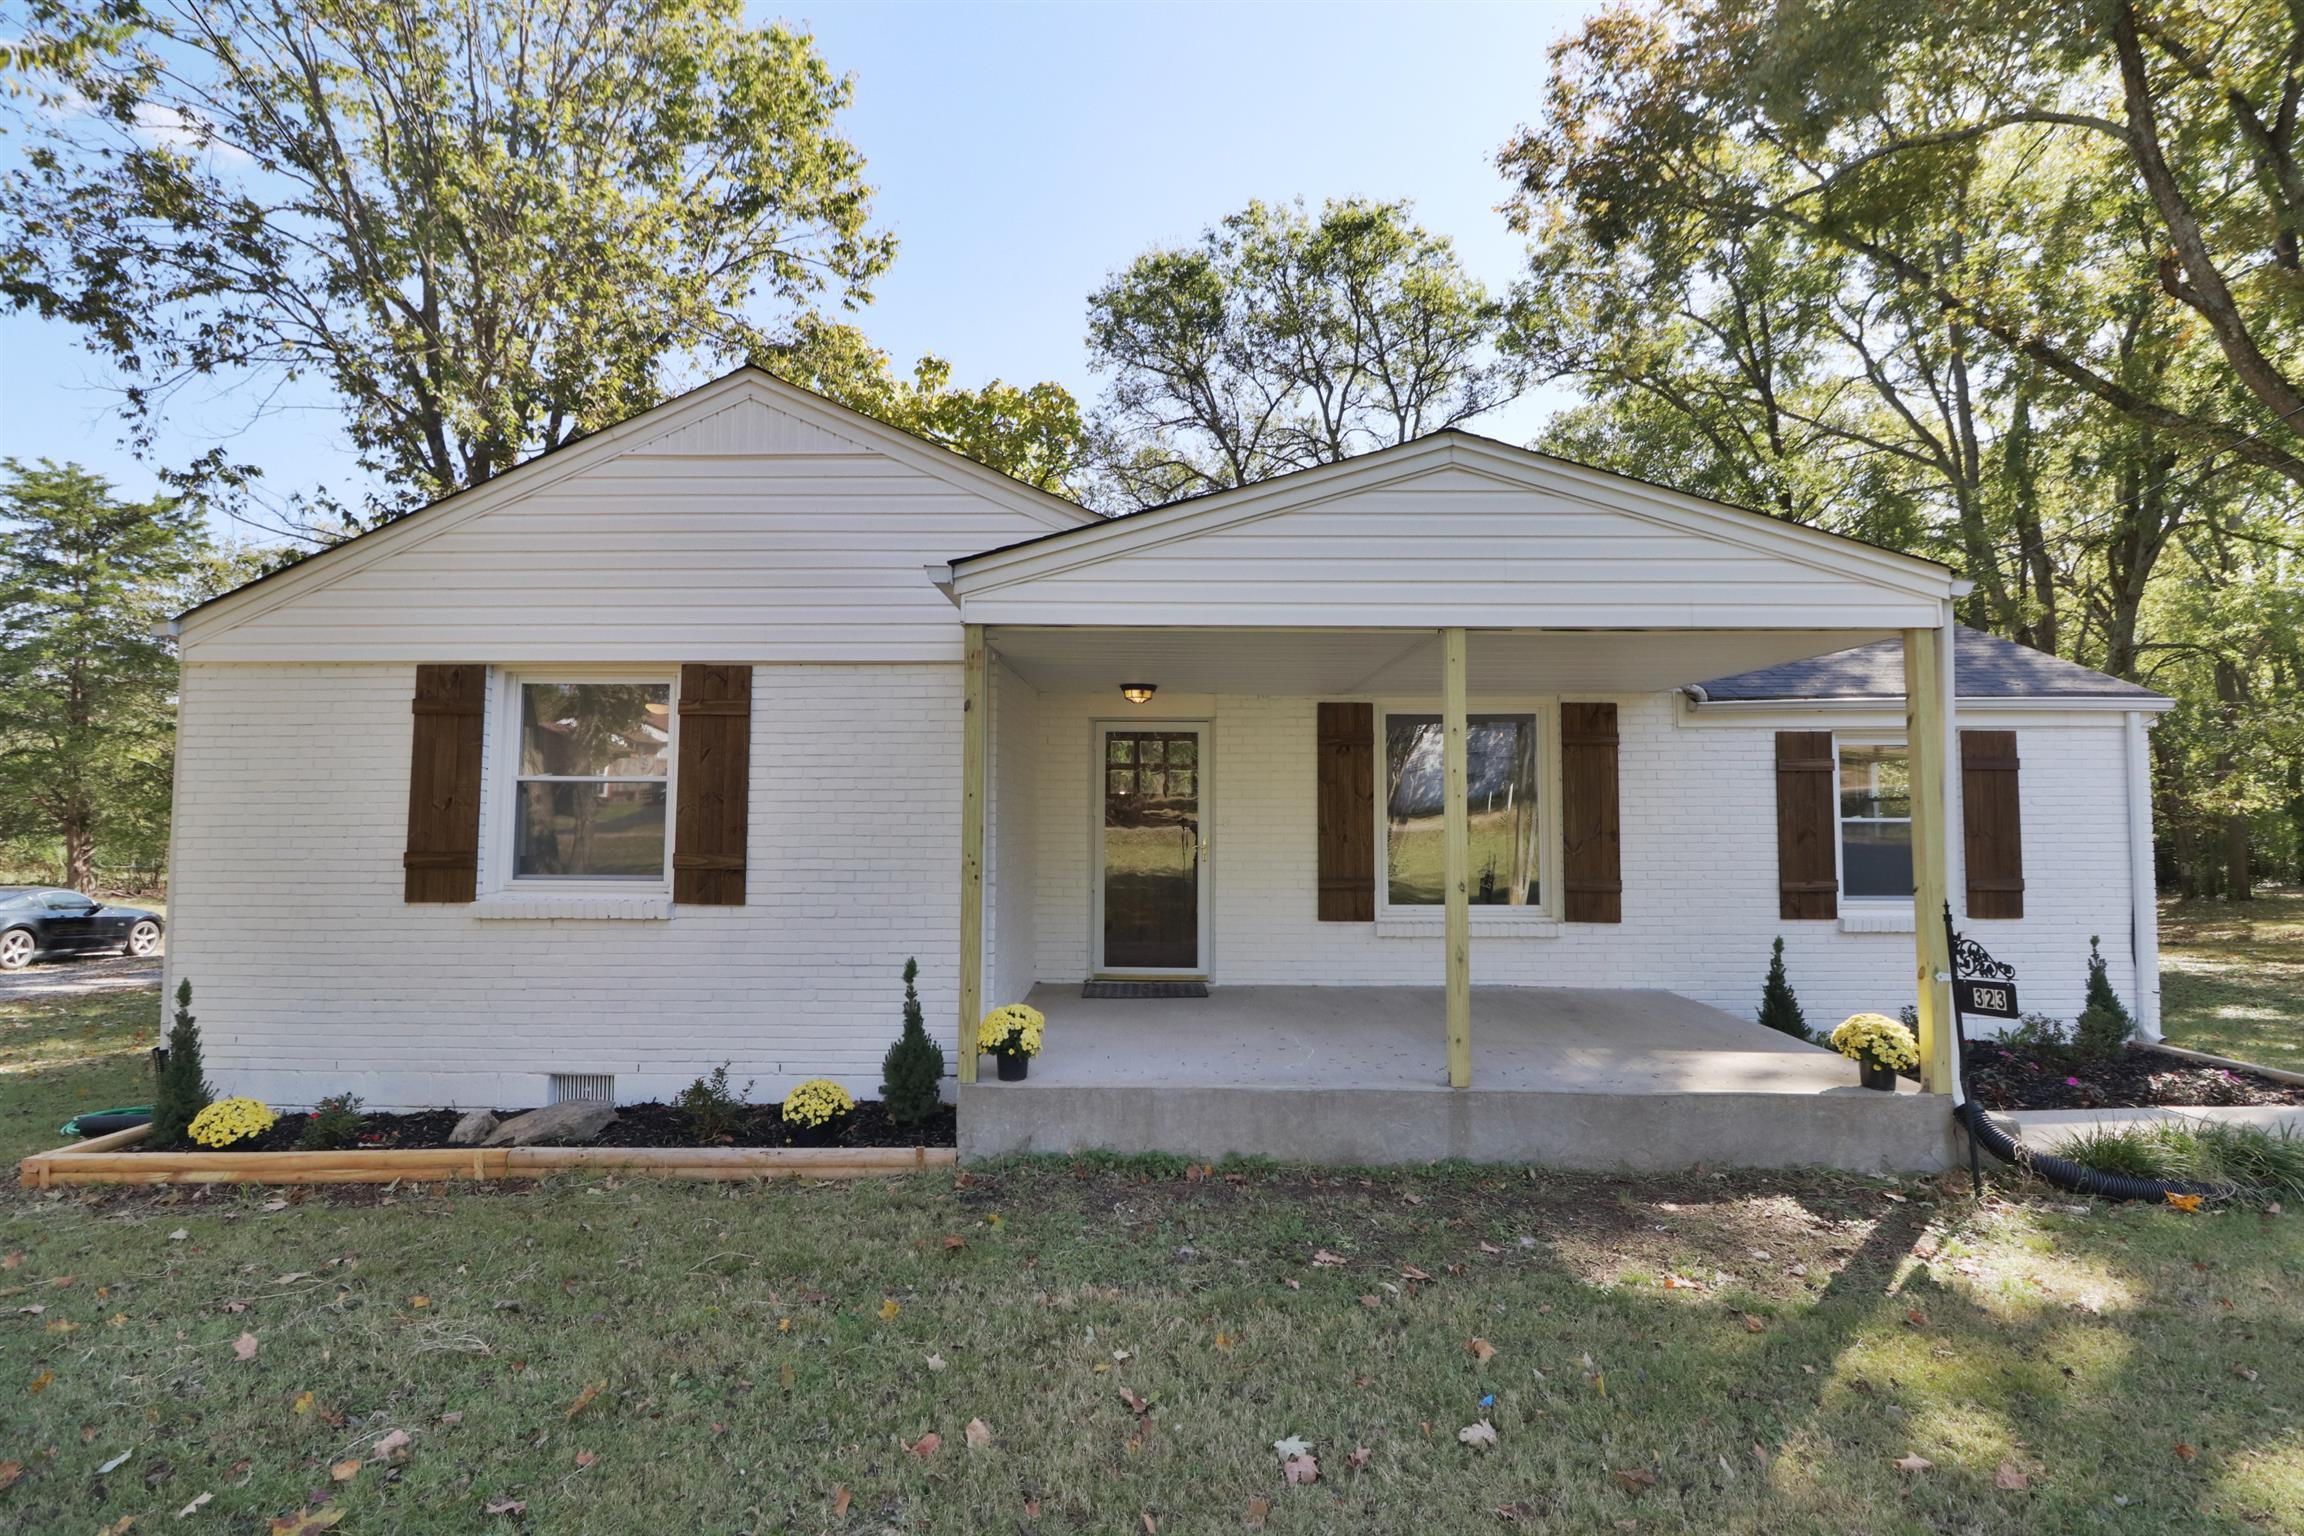 323 Hillcrest Dr, Madison, TN 37115 - Madison, TN real estate listing